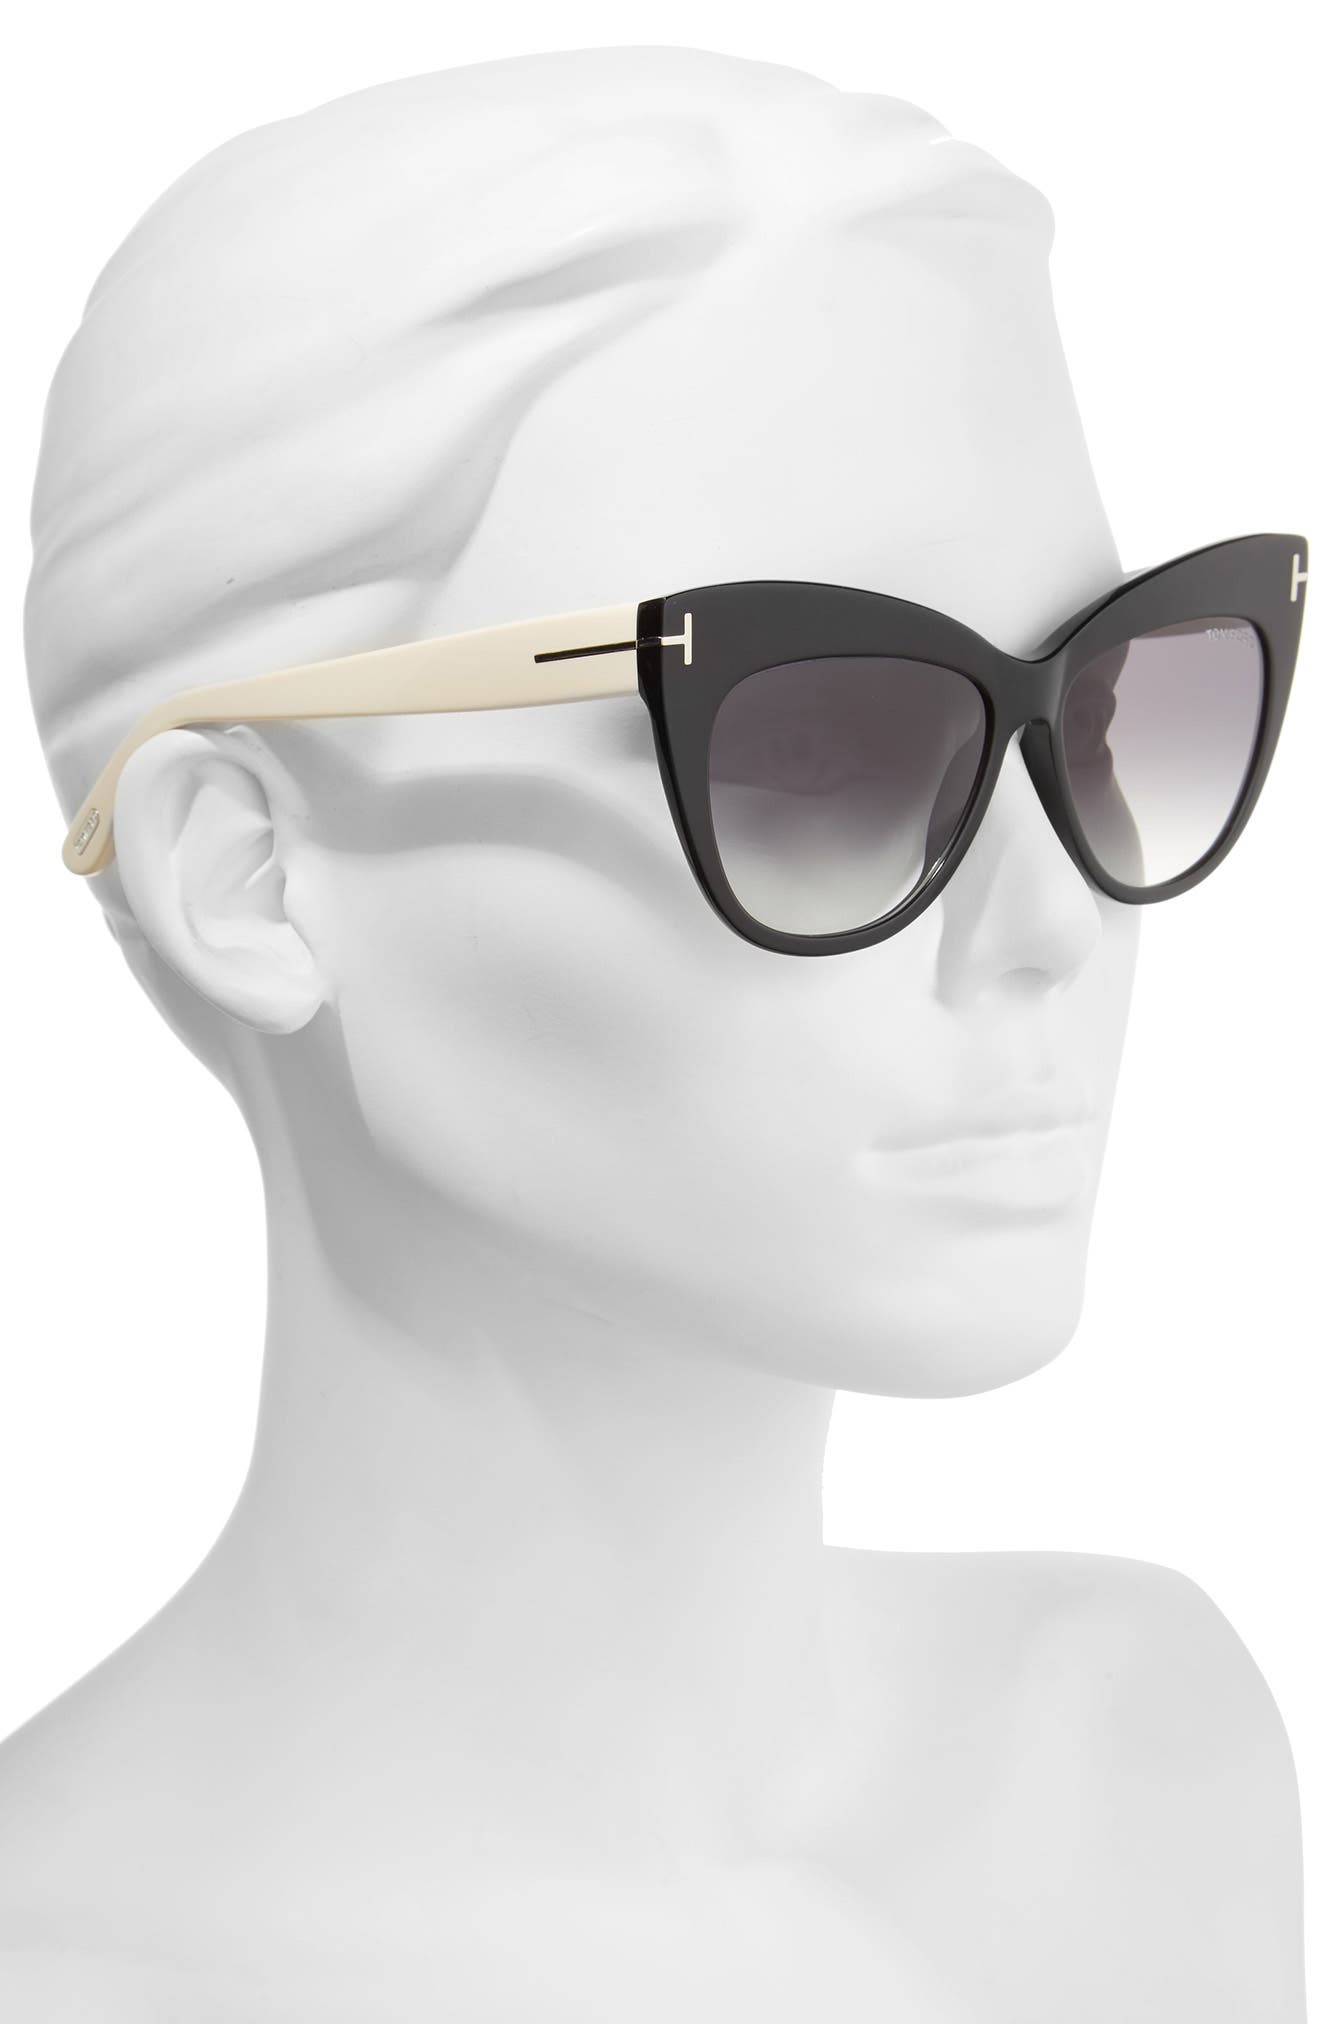 Nika 56mm Gradient Cat Eye Sunglasses,                             Alternate thumbnail 2, color,                             001